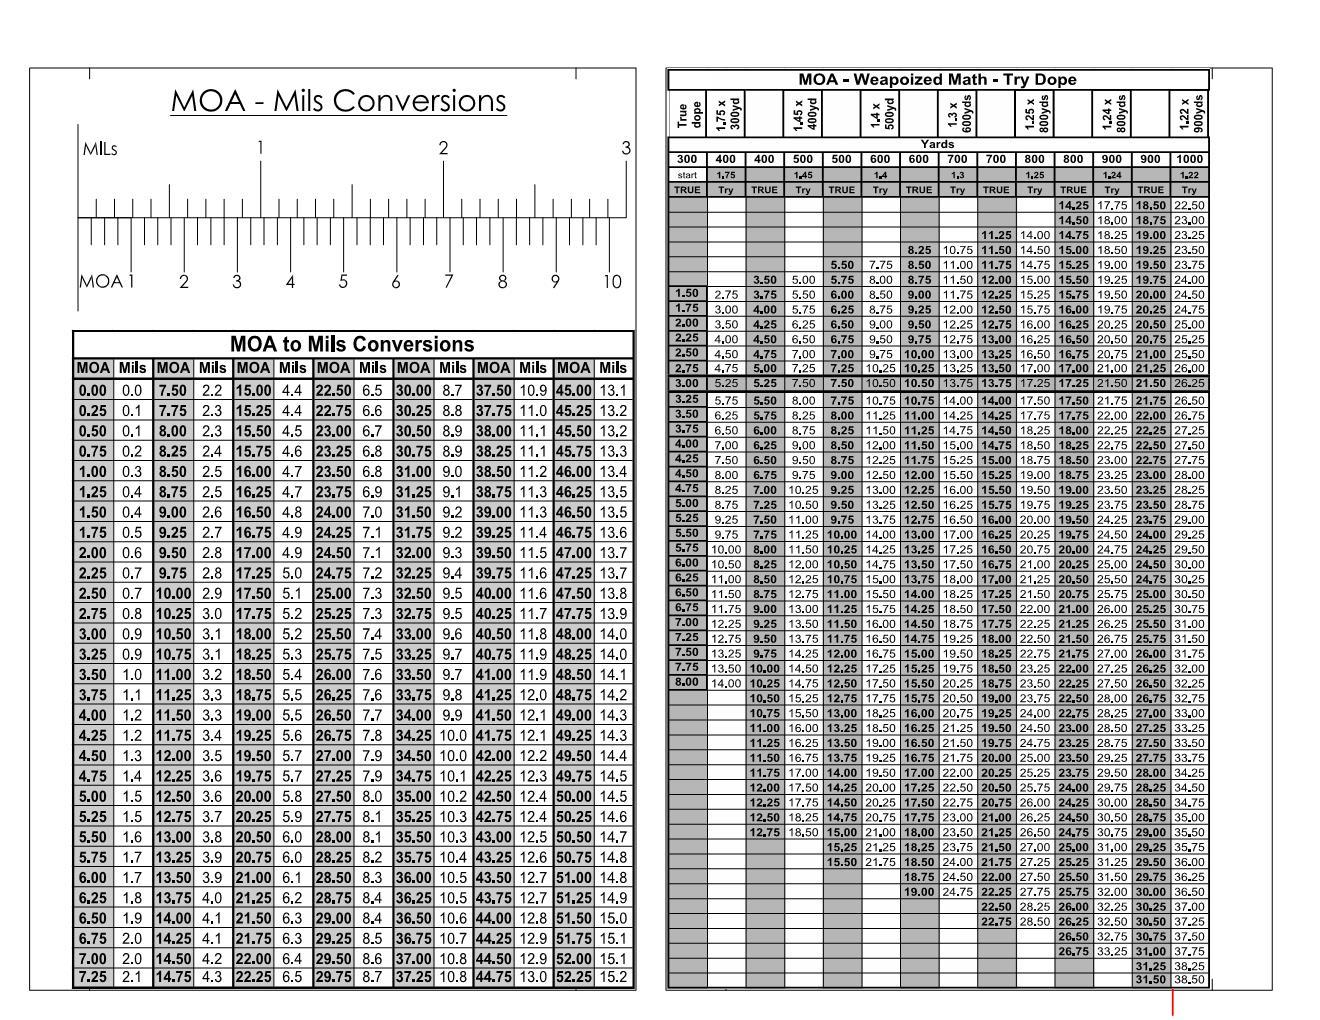 Wepaonized Math MOA.jpg